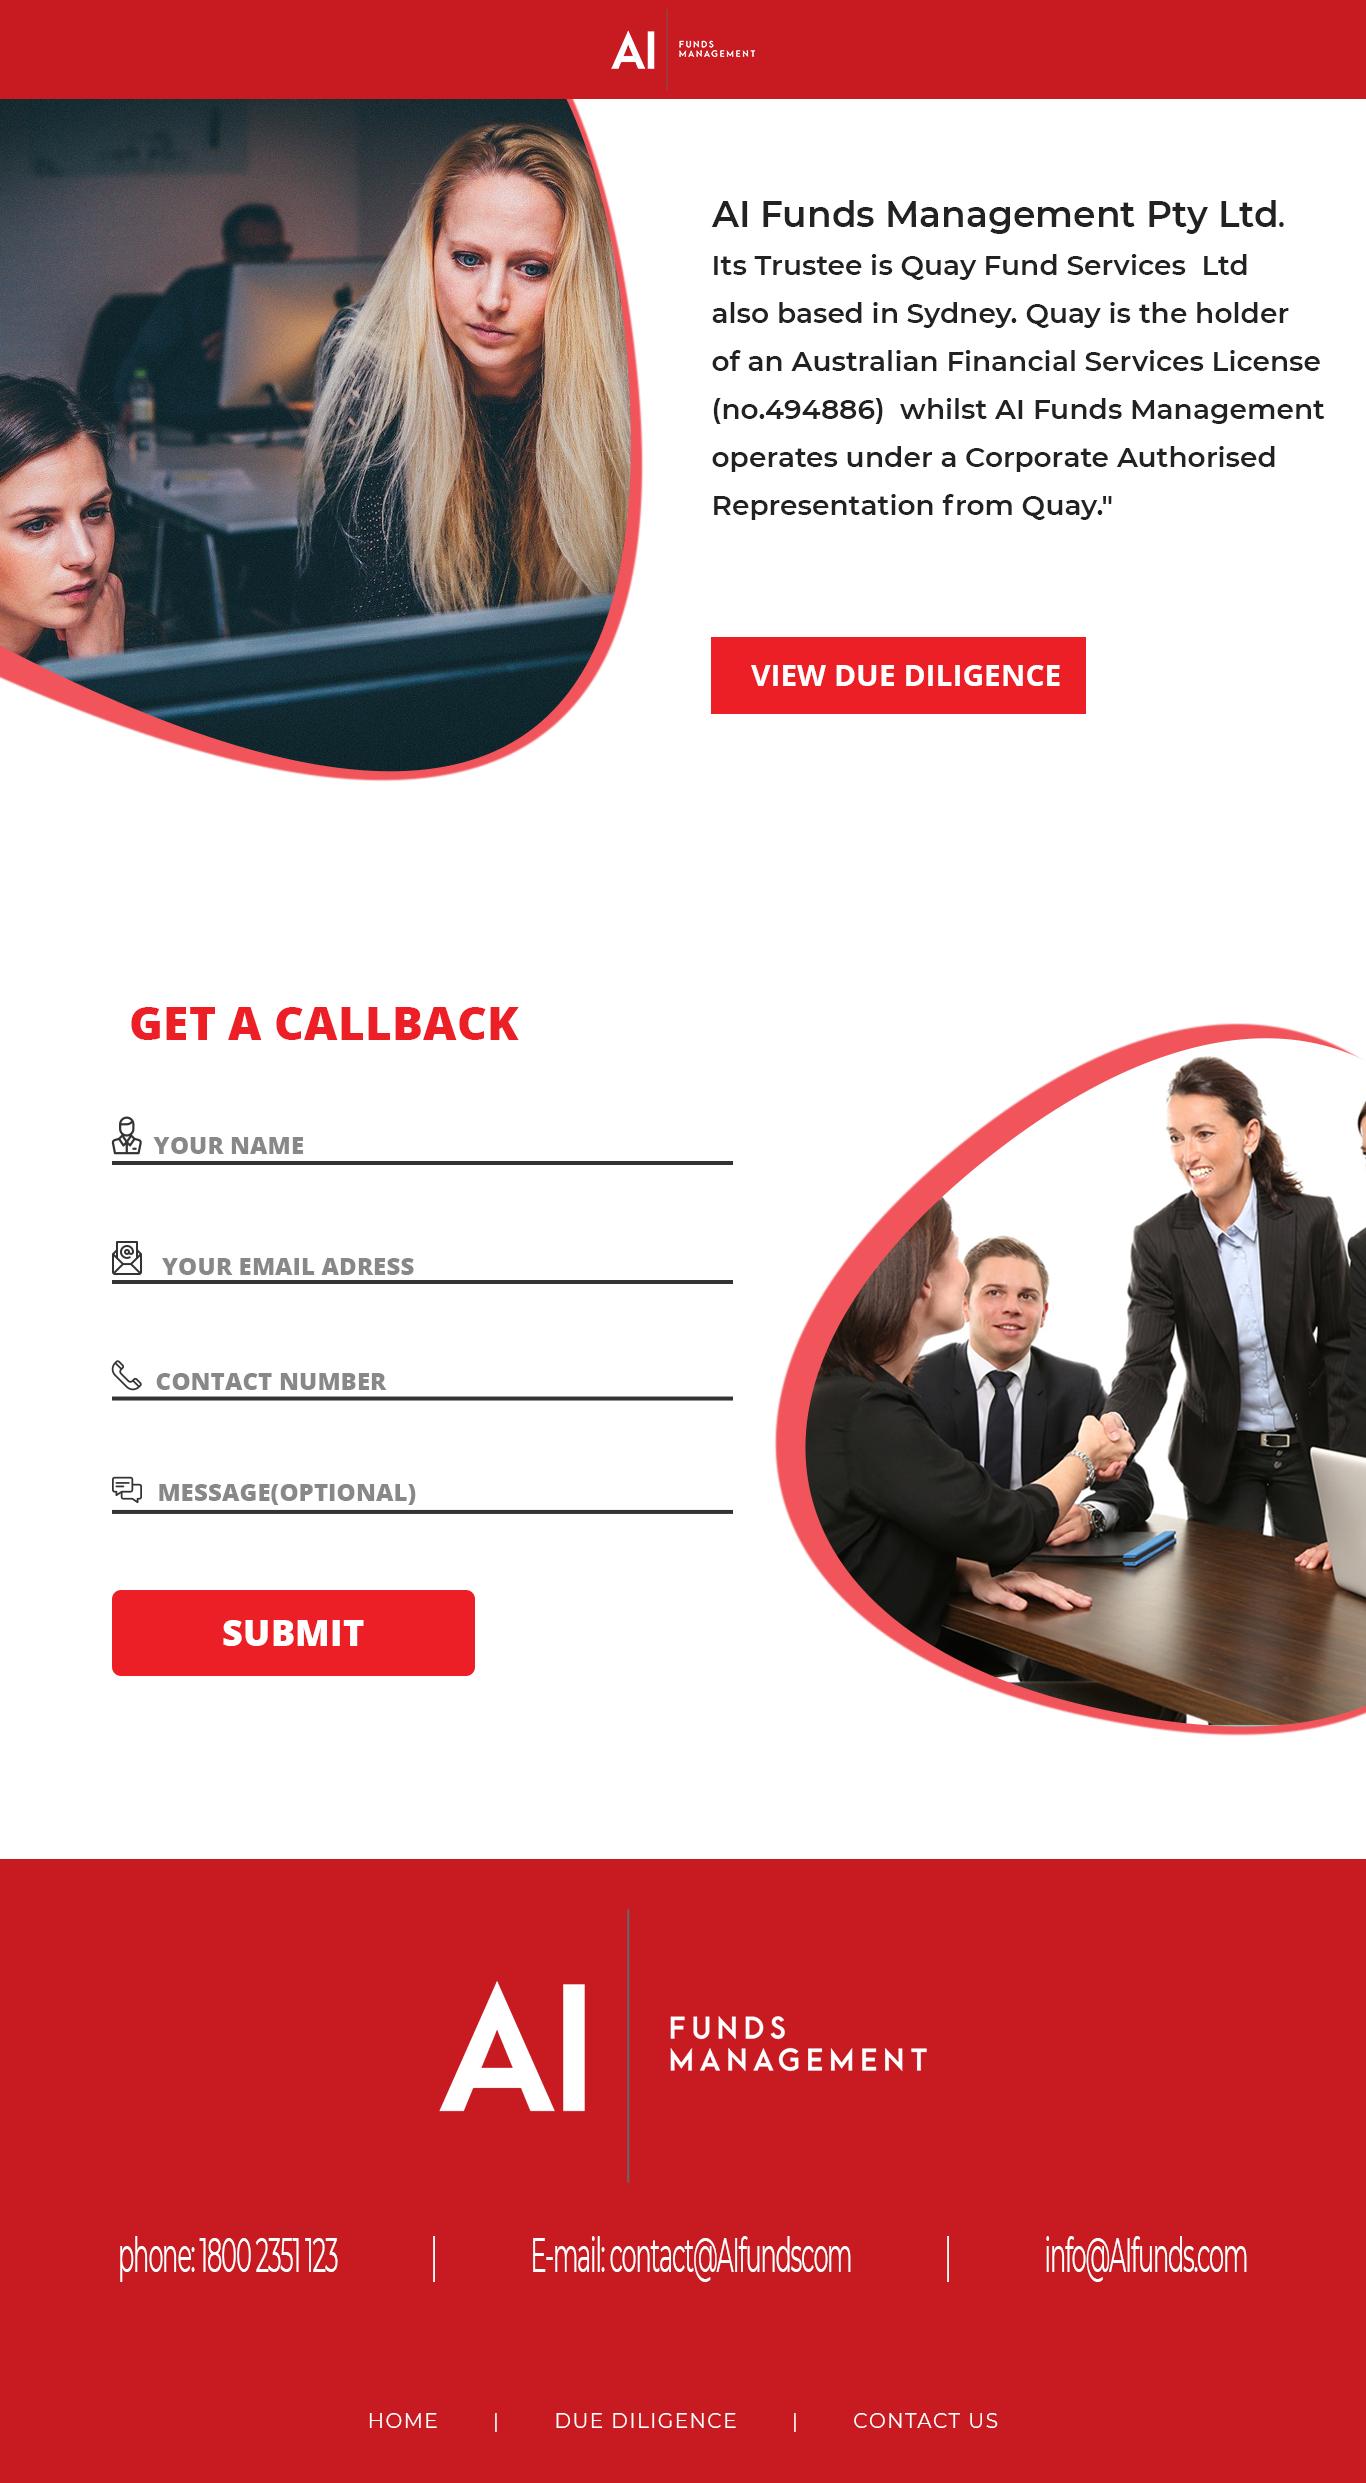 Web Design For A Company By Designtiel Design 23621915